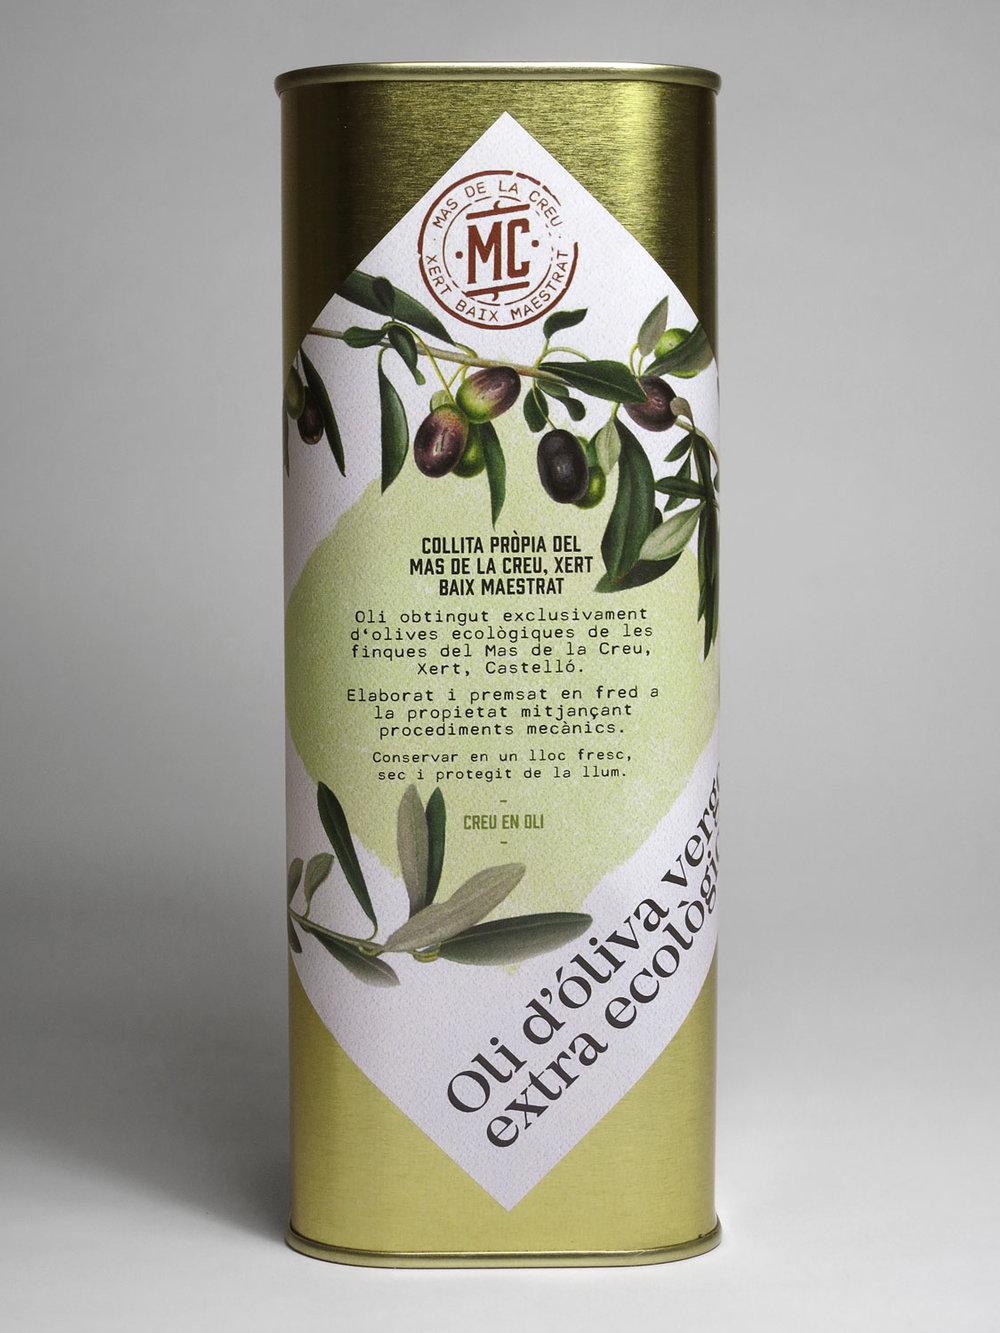 3-creu-en-oli-aceite-oliva-virgen-diseño-packaging-serraysaez-manuel-serra-saez-designer-graphic.jpg